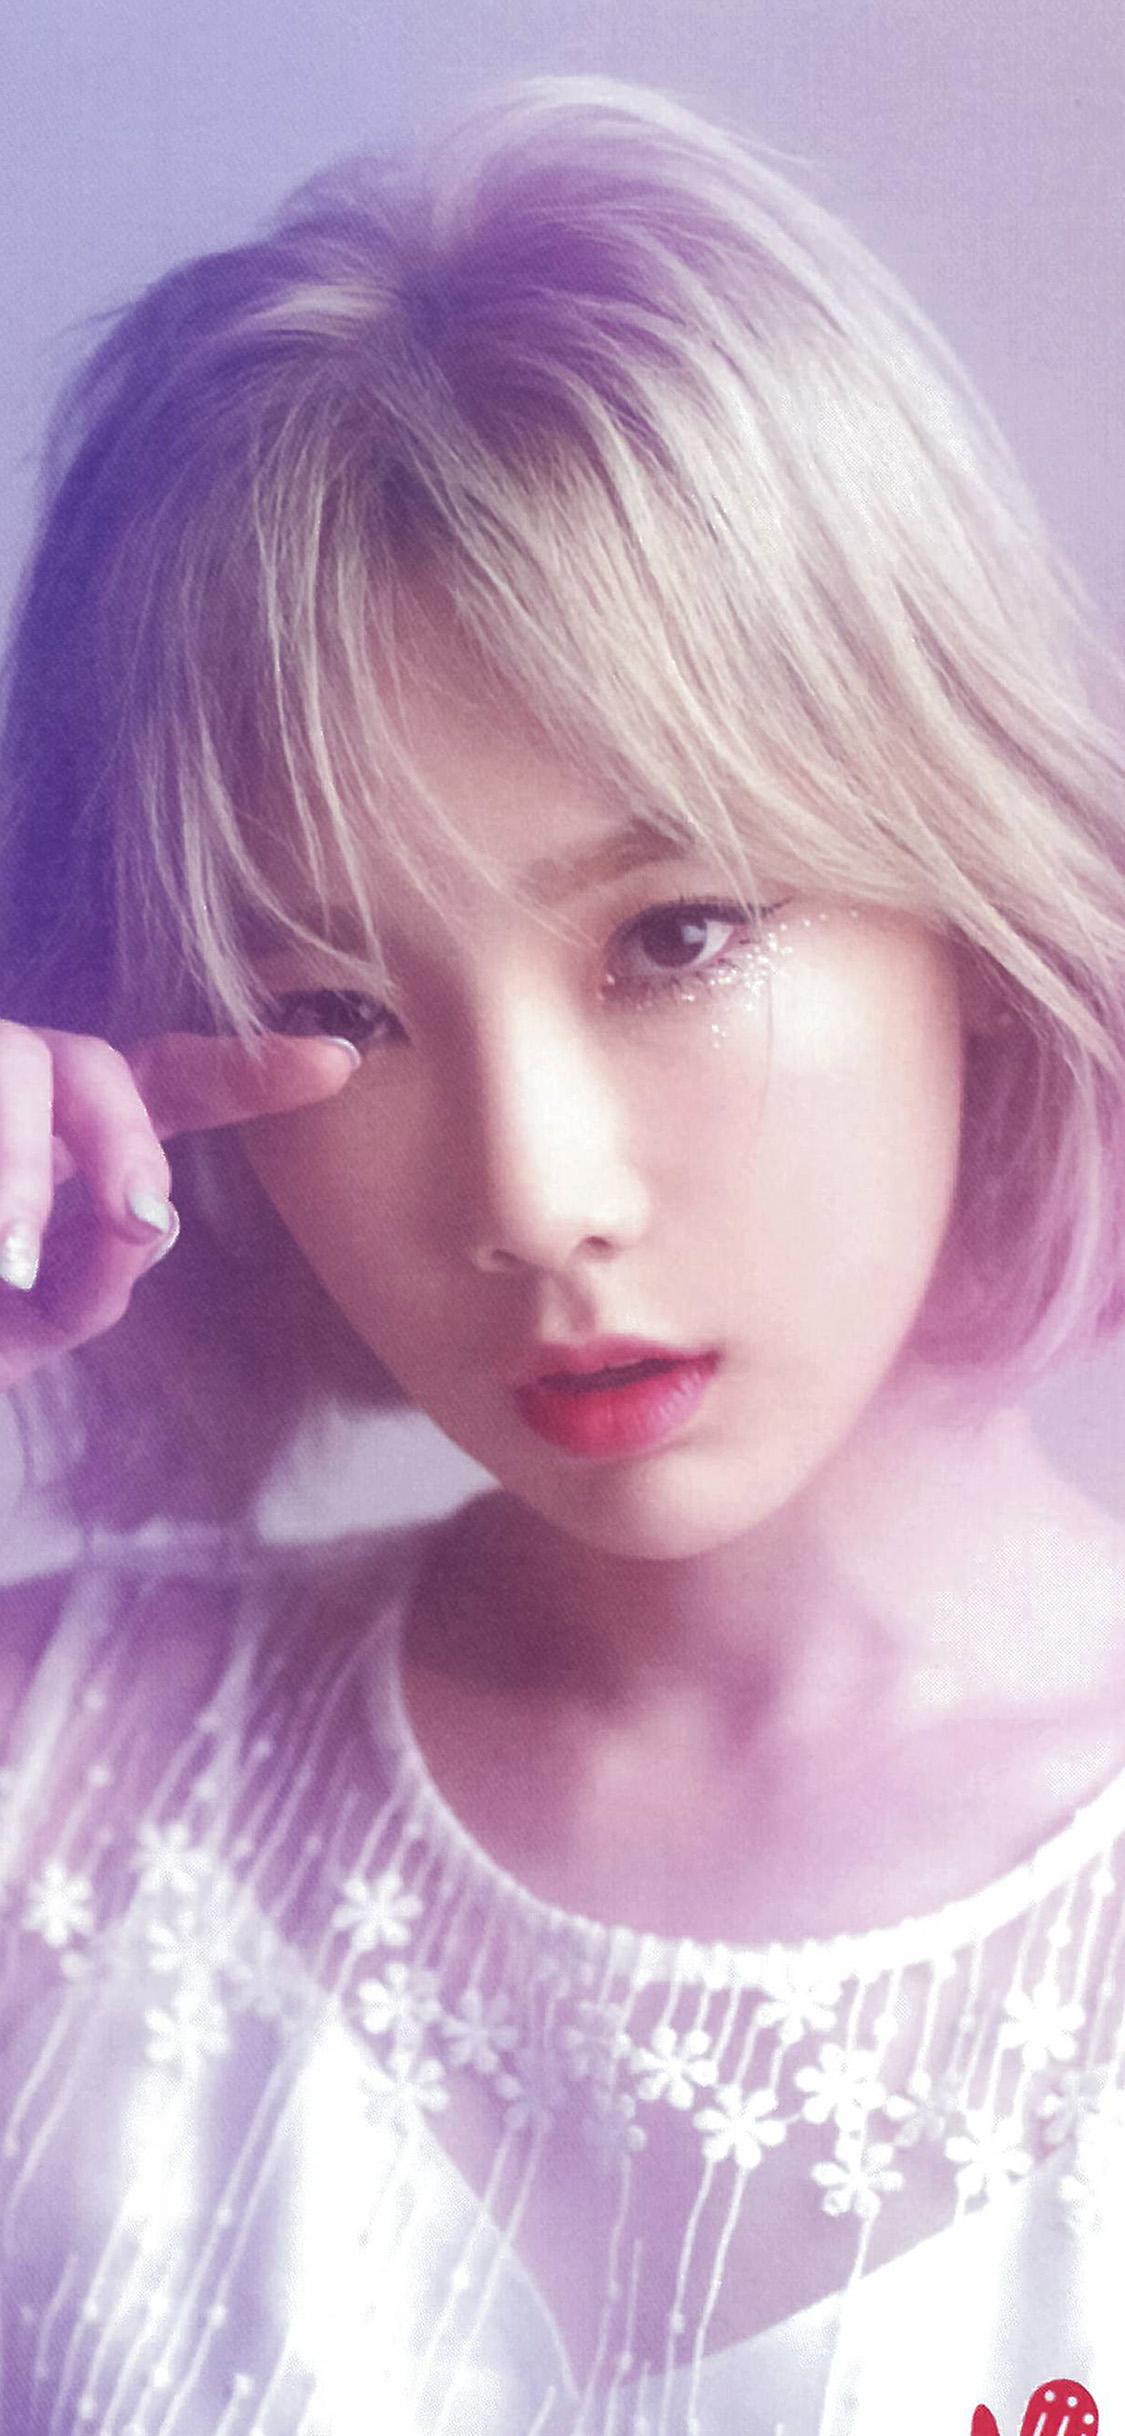 iPhonexpapers.com-Apple-iPhone-wallpaper-hr45-girl-kpop-taeyeon-pink-music-snsd